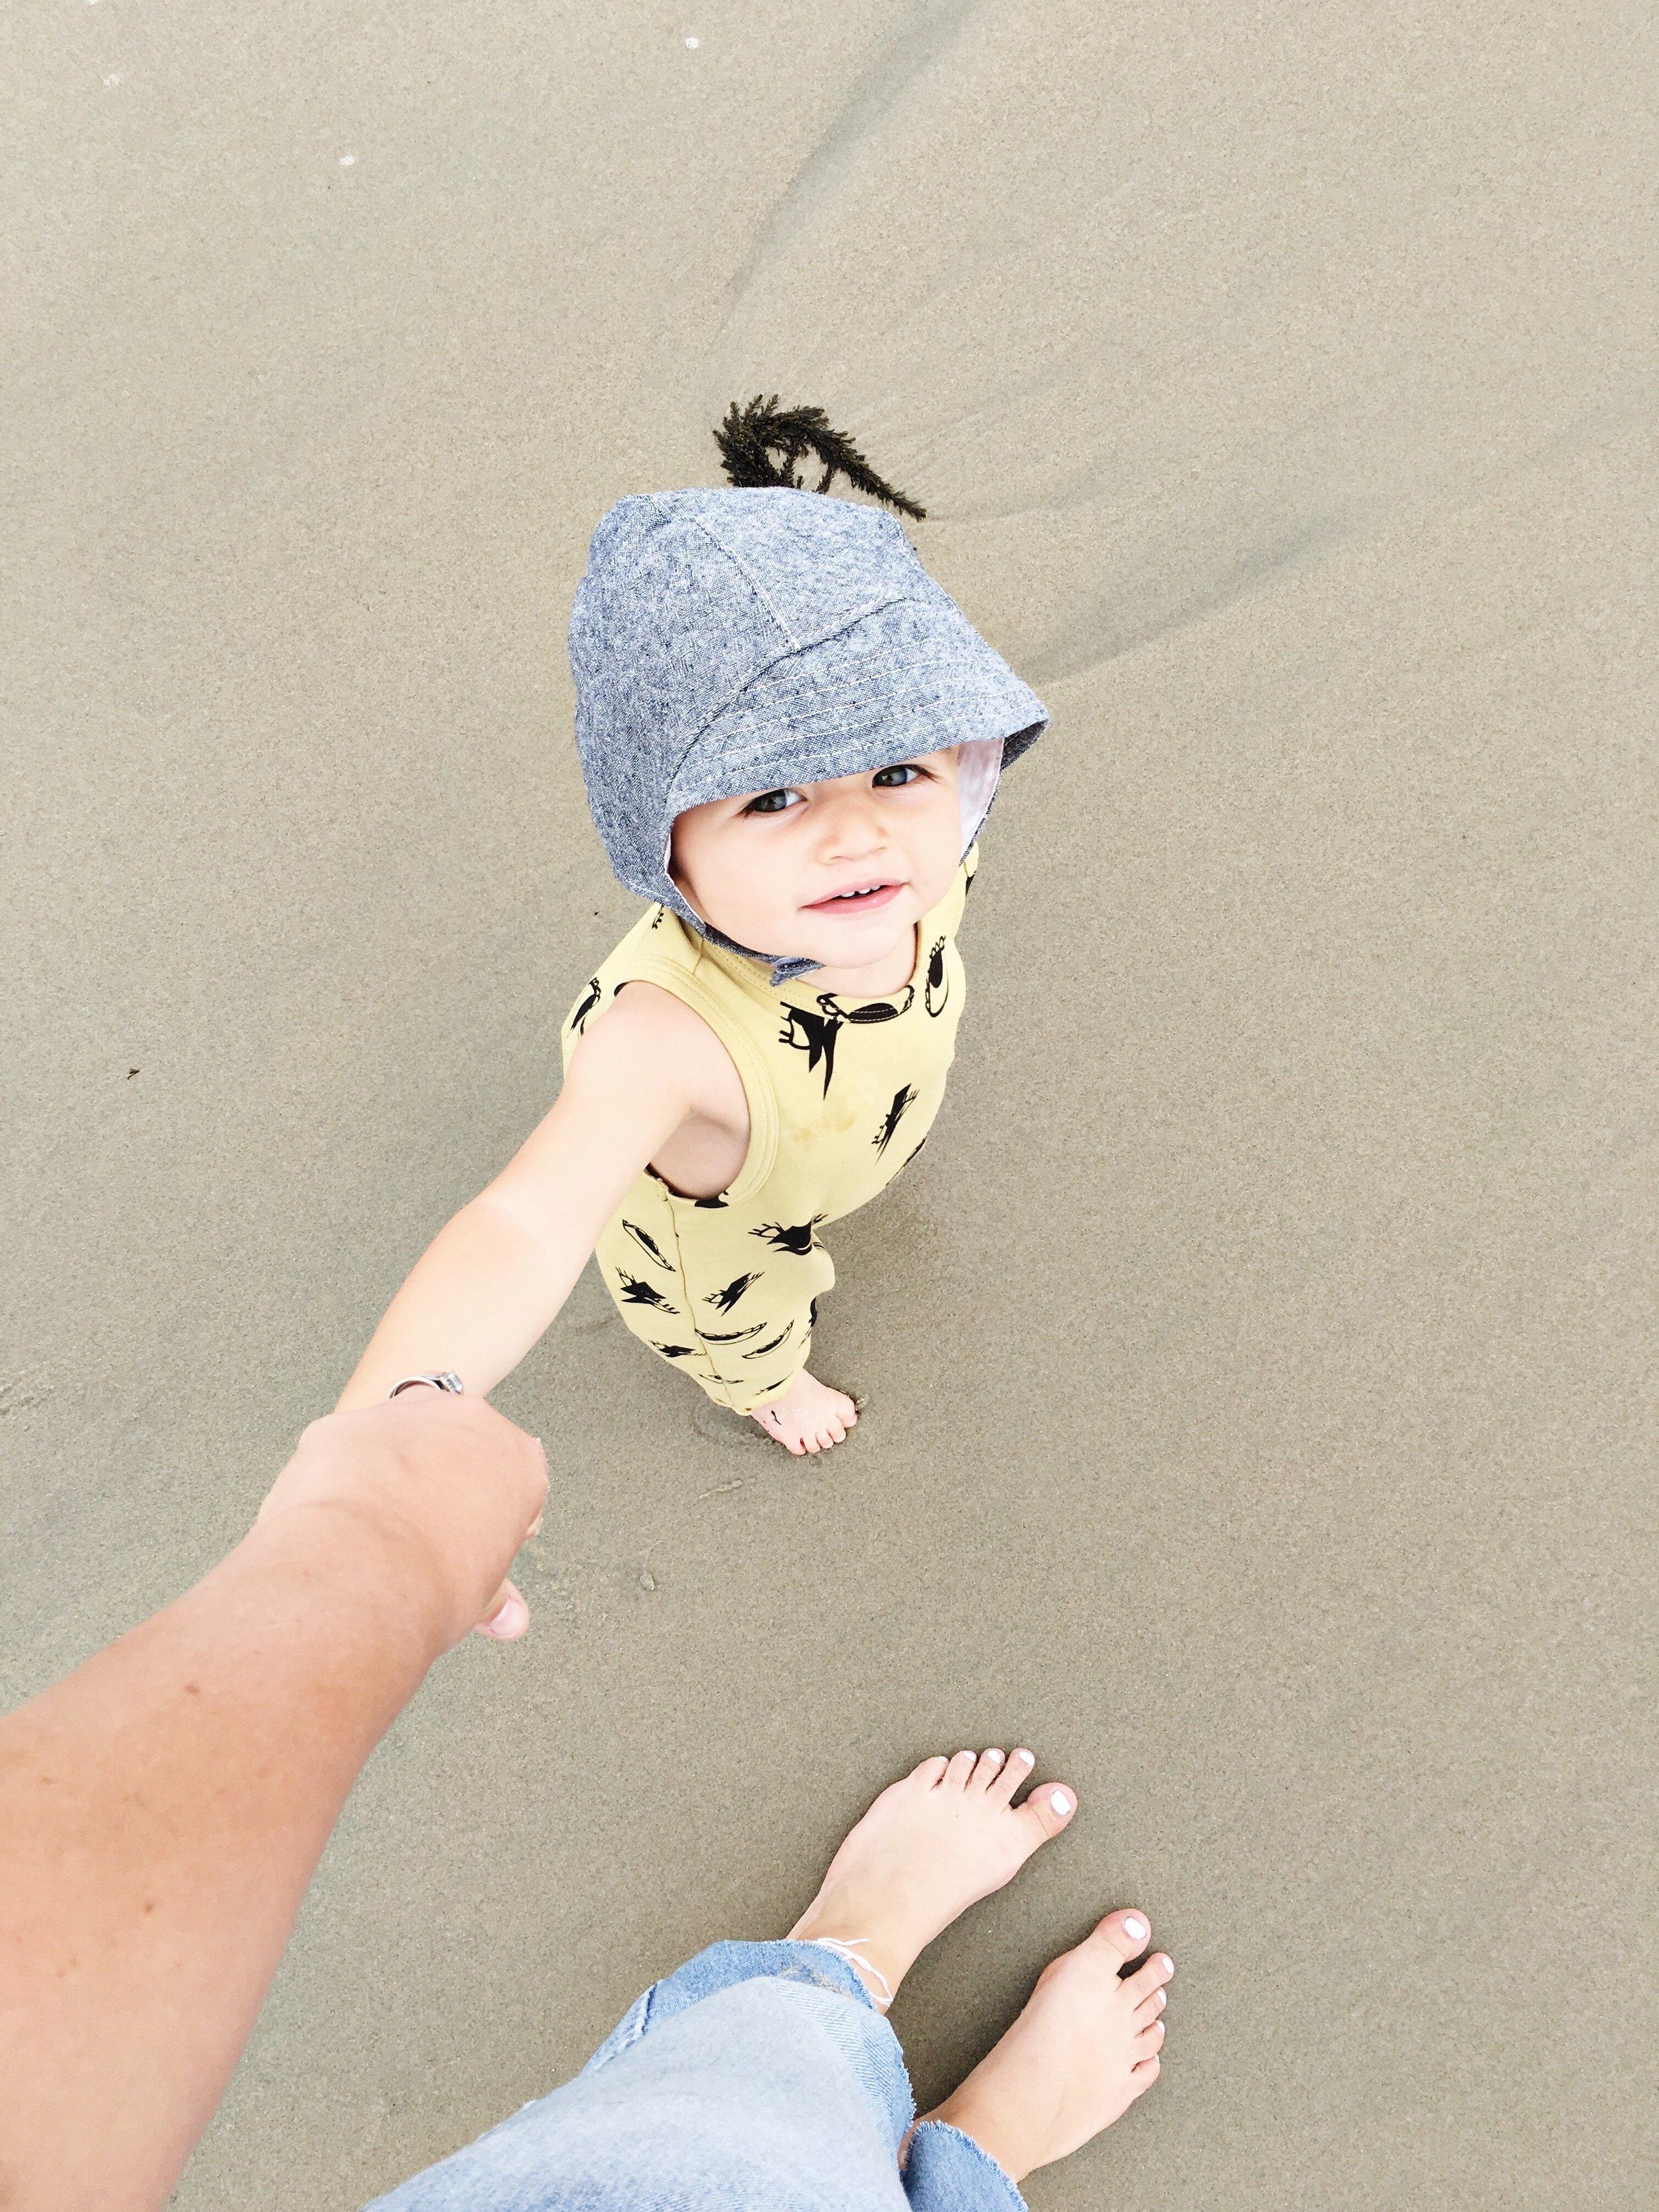 Baby boy sun bonnet  for beach walks with mom,via Blue Corduroy on Etsy. Photo by  Sarah Holstrom